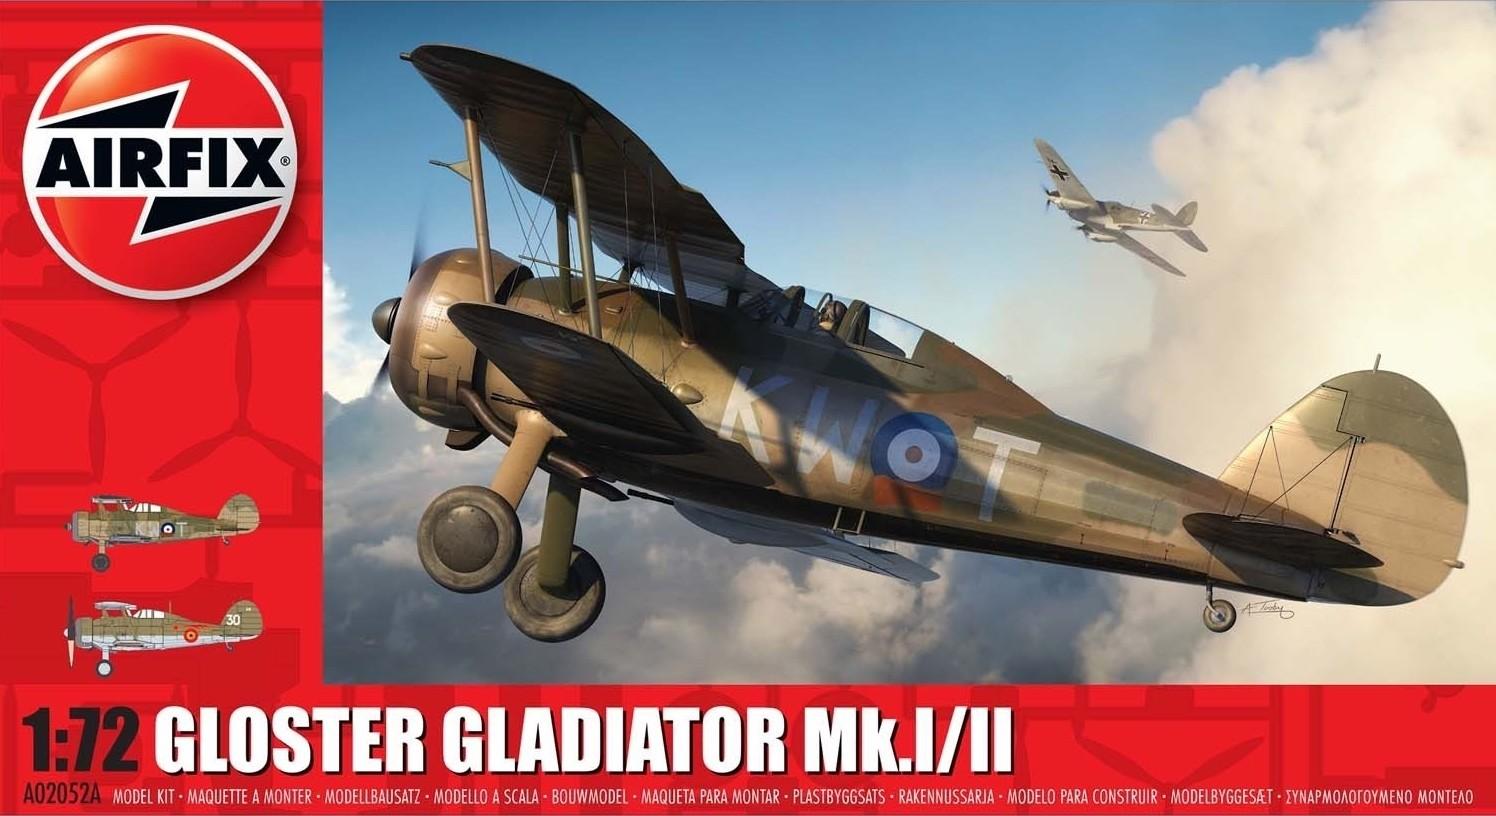 Gloster Gladiator Mk.I NEW TOOLING